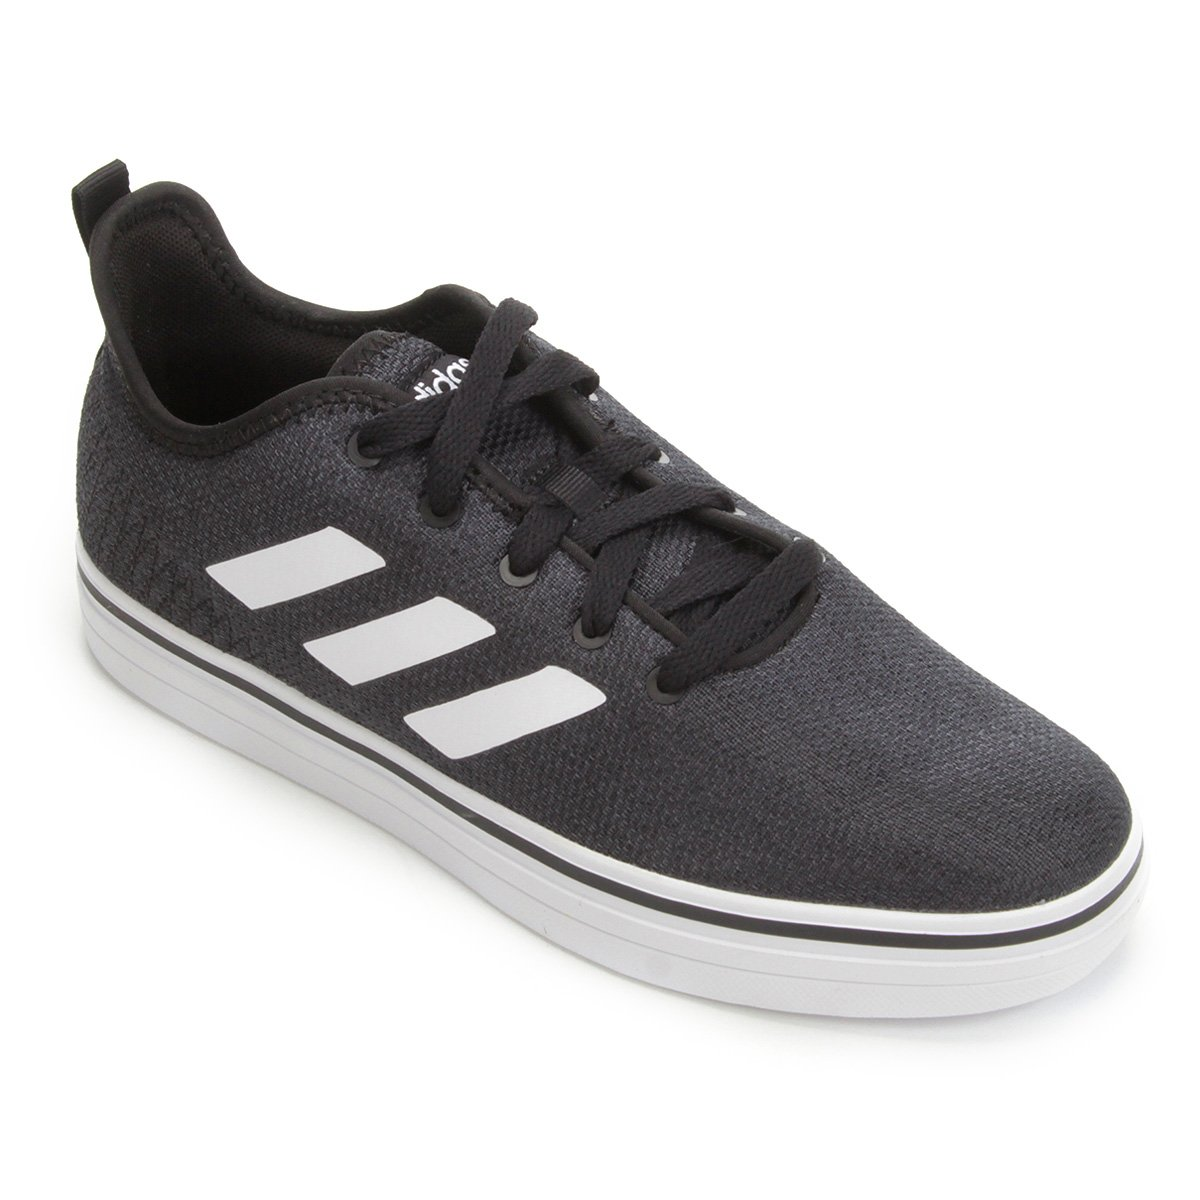 6d2b1f005b Tênis Adidas True Chill Masculino - Compre Agora